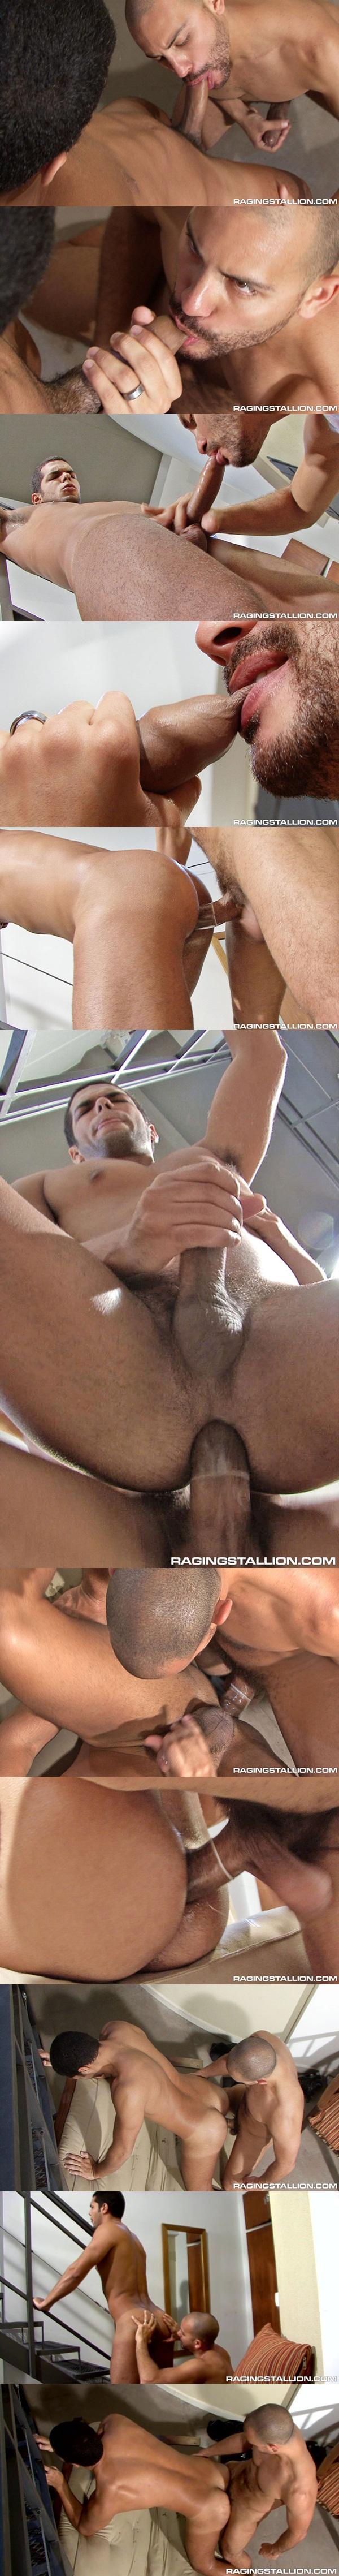 Bahiano Fox takes Antonio Biaggi's big dick at Ragingstallion 02